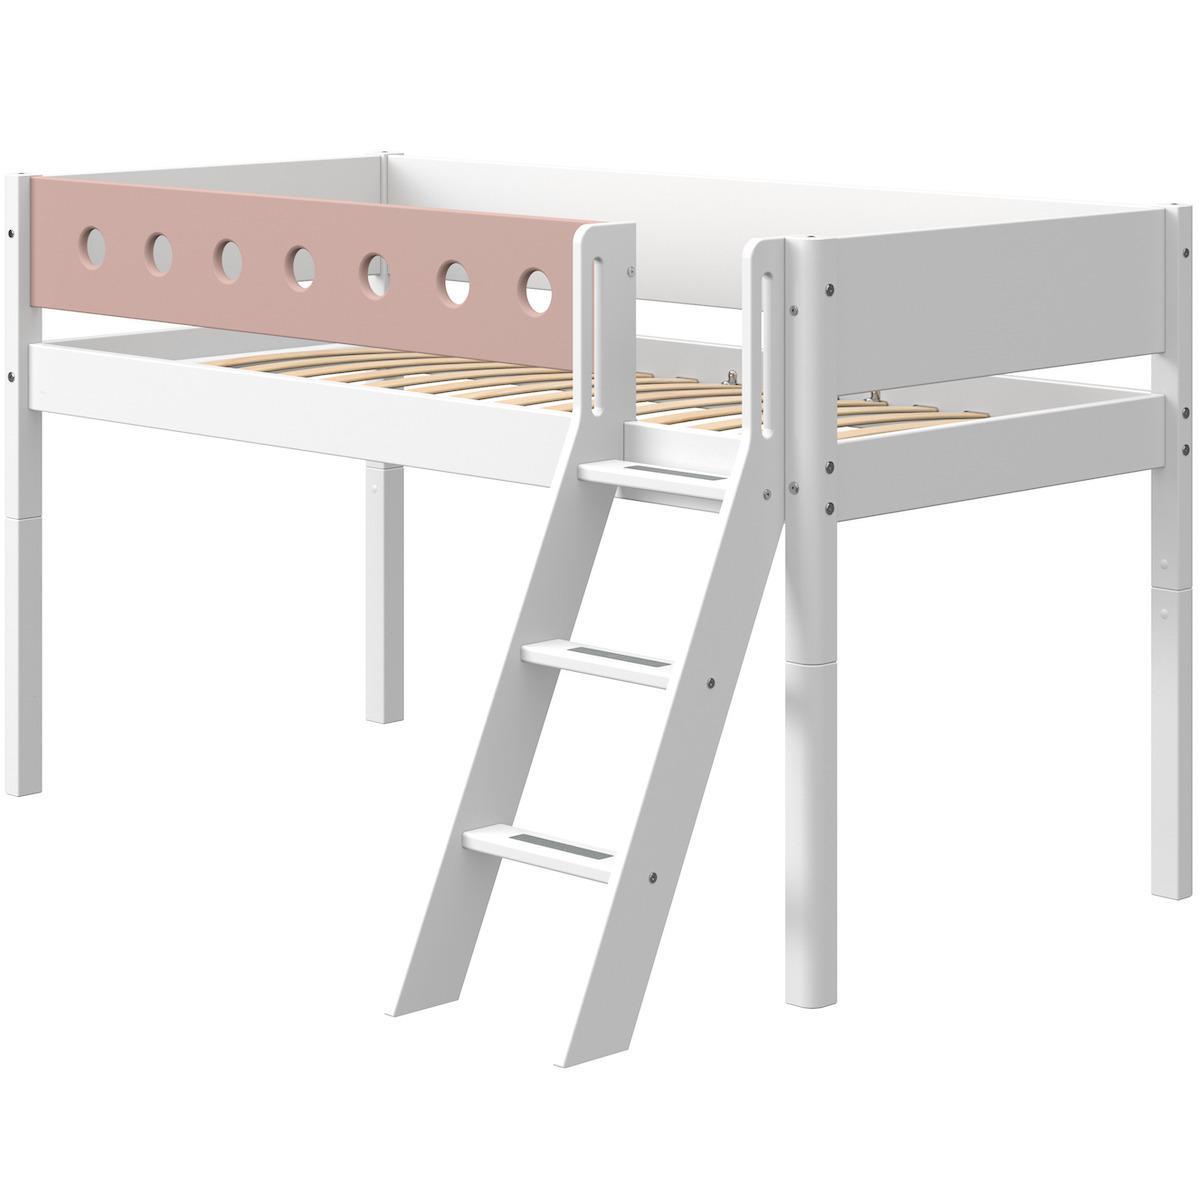 Cama media alta 90x200cm escalera inclinada WHITE Flexa blanco-rosa claro